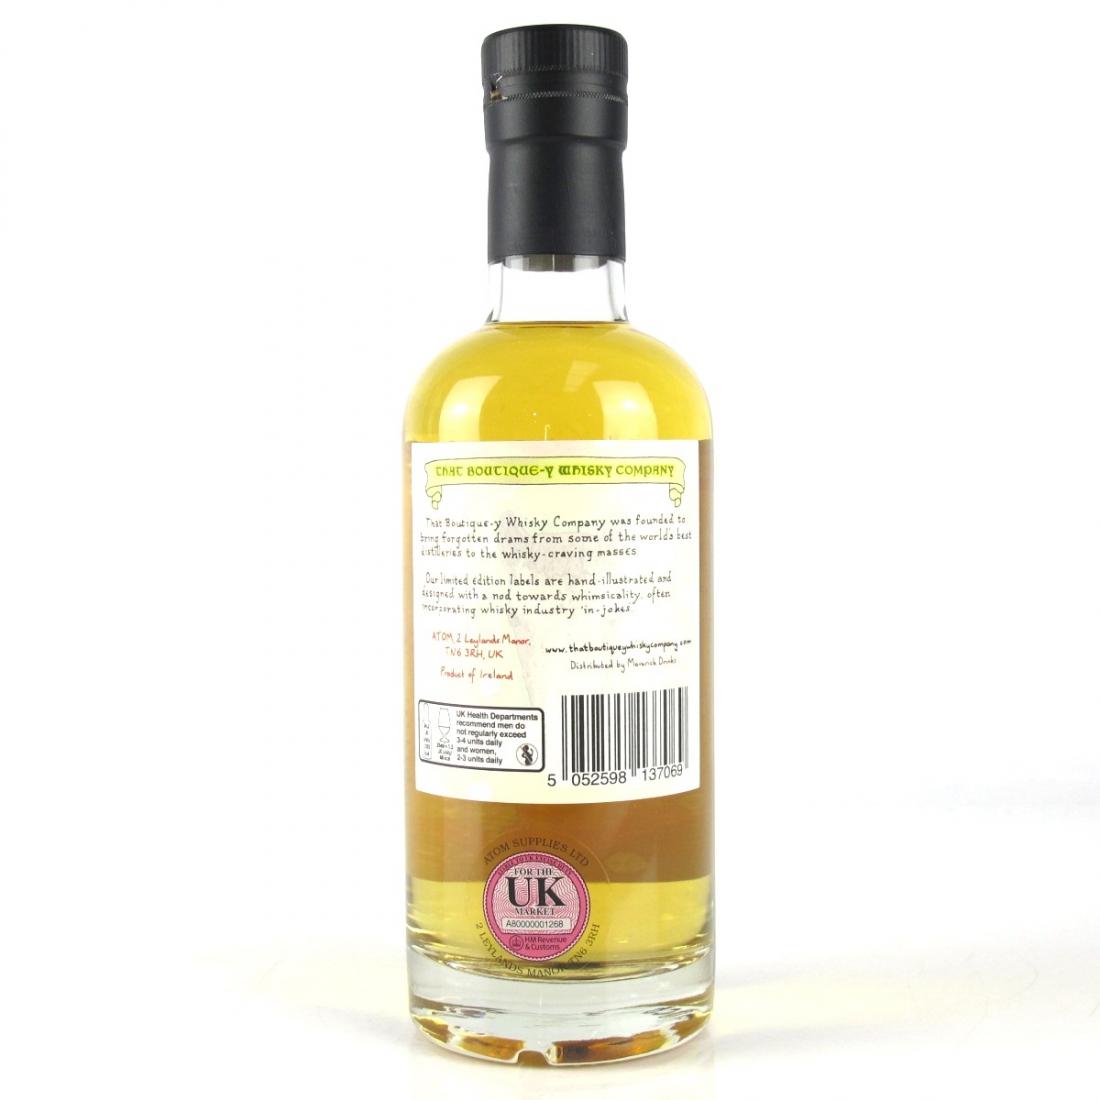 Irish Single Malt That Boutique-y Whisky Company 13 Year Old Batch #2